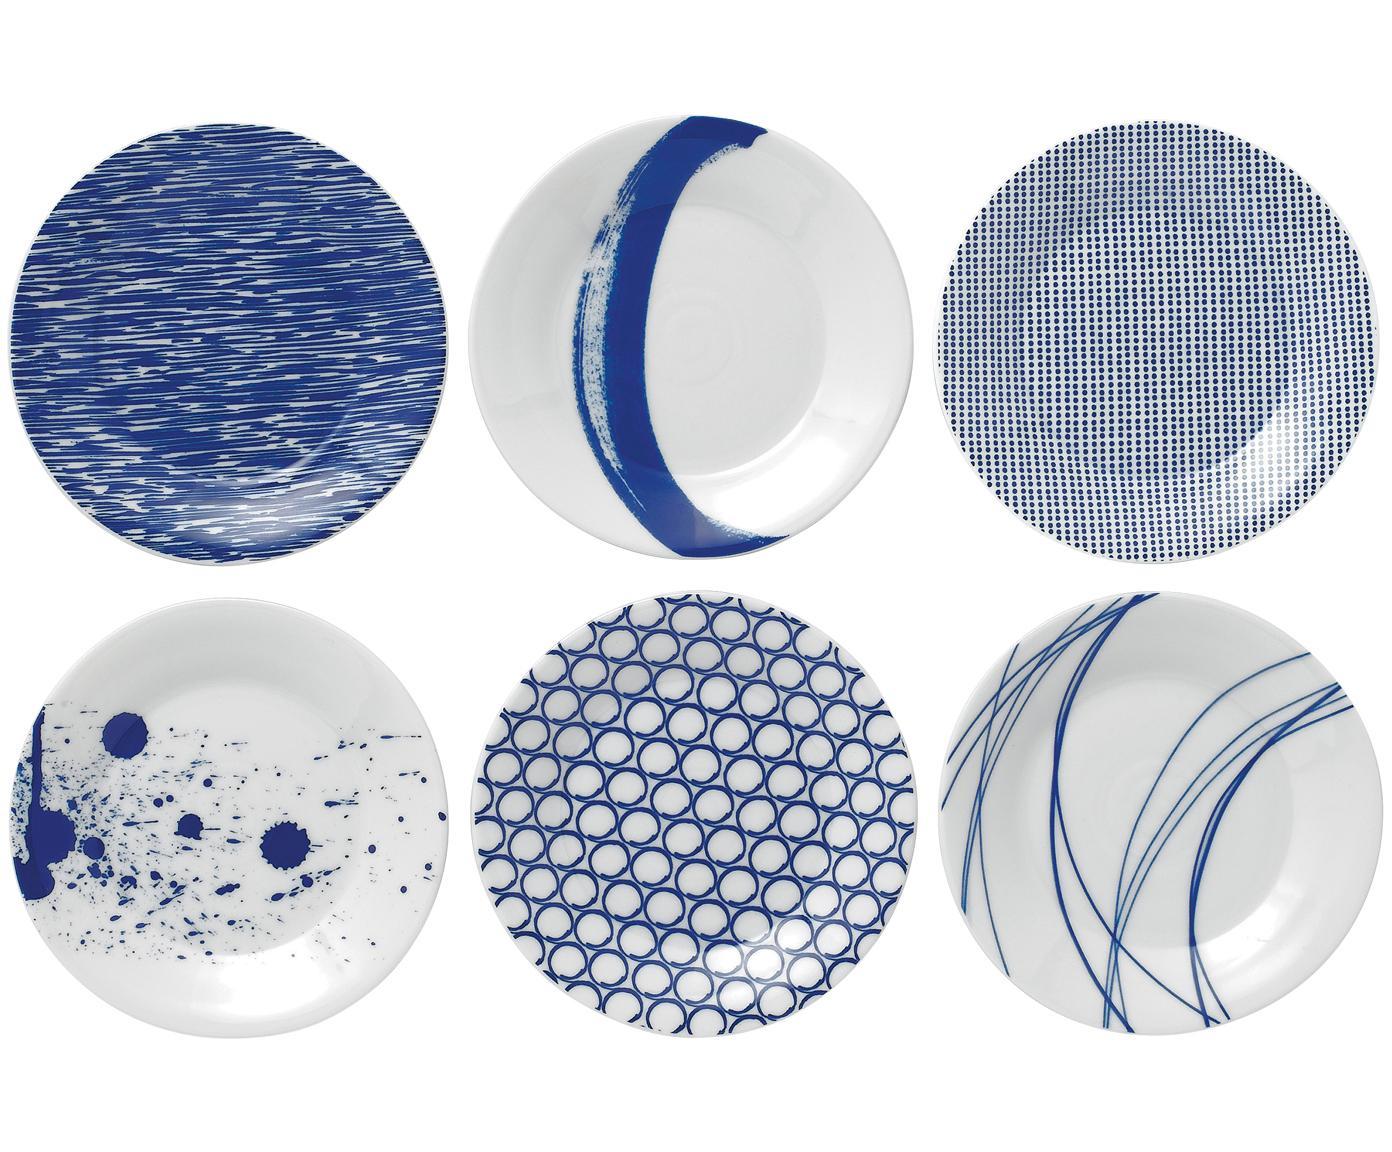 Ontbijtbordenset Pacific, 6-delig, Porselein, Wit, blauw, Ø 16 cm